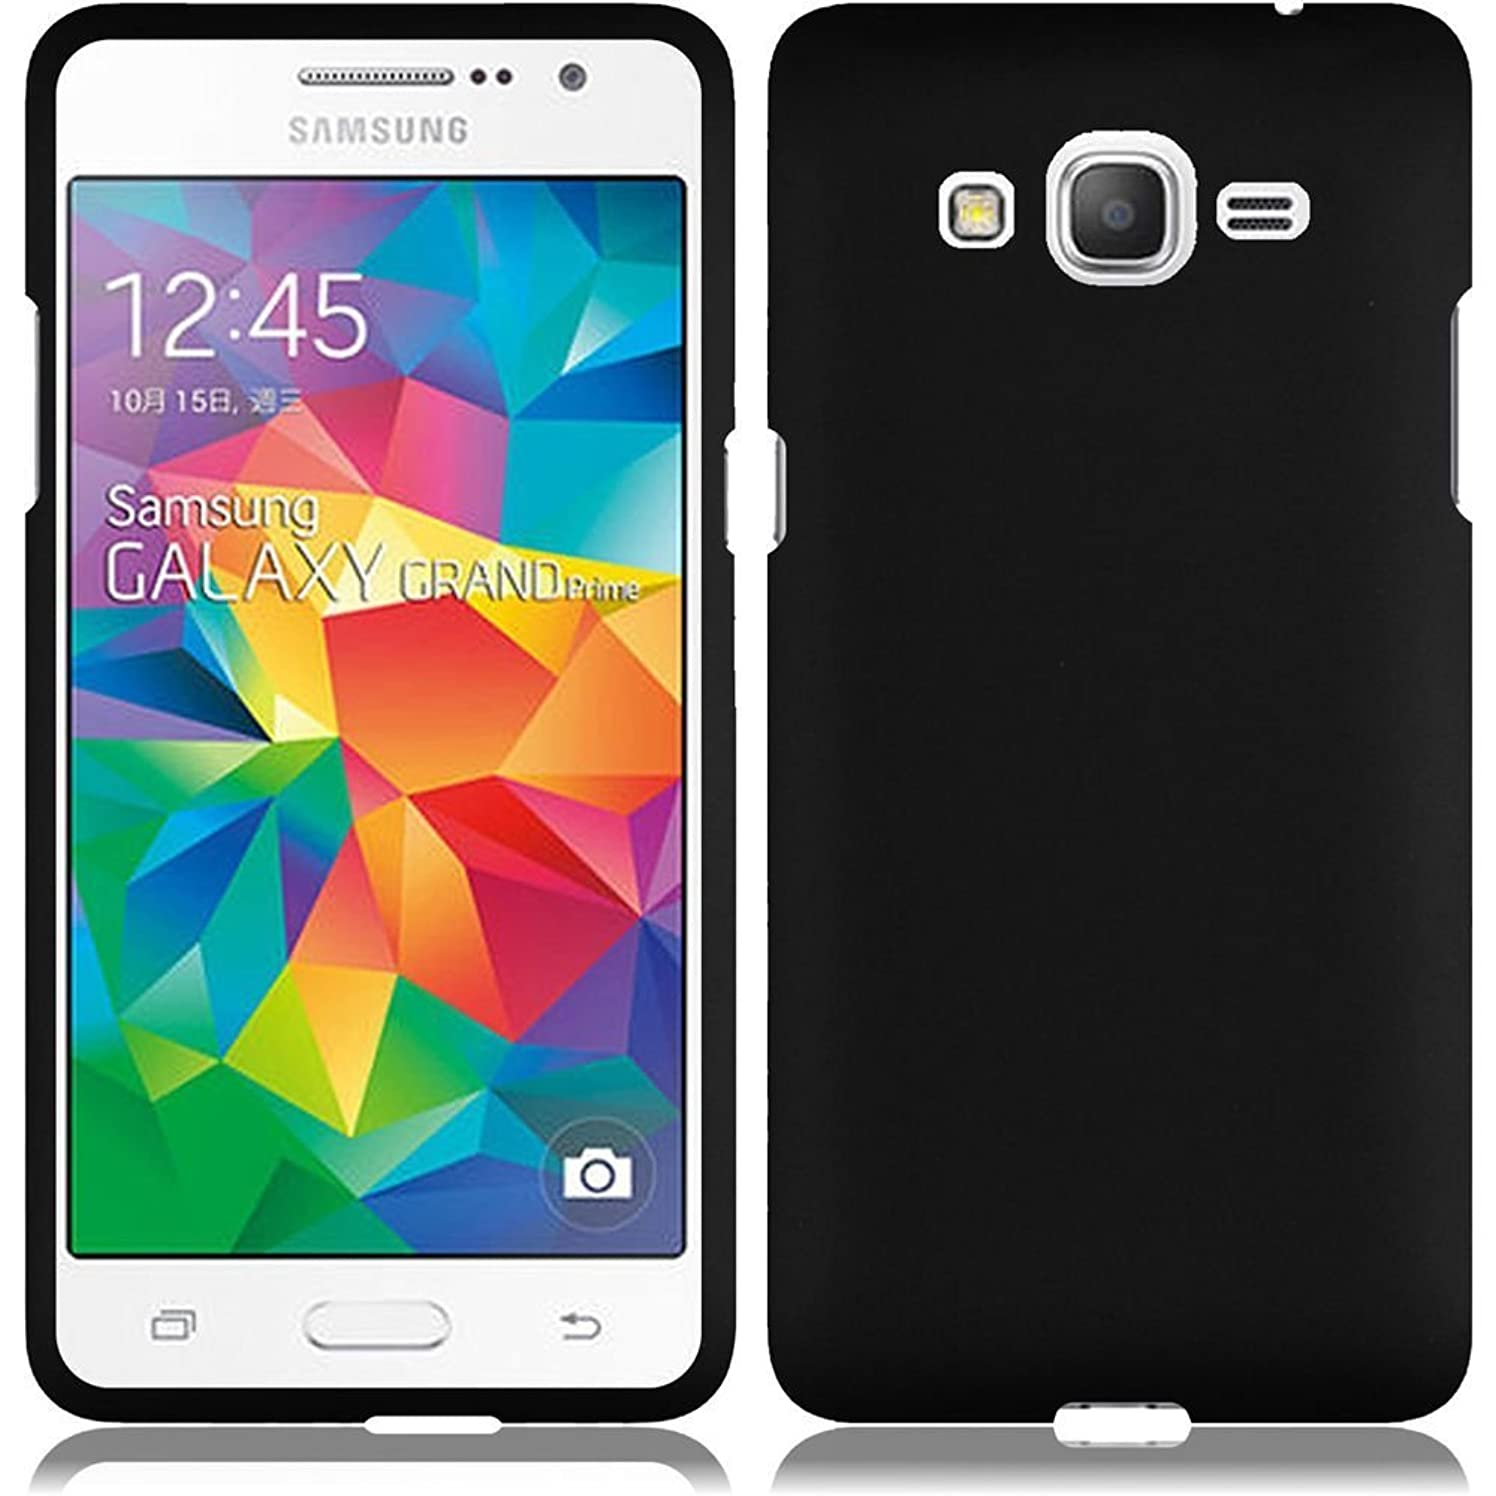 Wydan Case for Samsung Galaxy Grand Prime, Go Prime - Rubberized 2-Piece Snap On Hard Case Cover - Black w/Wydan Stylus Pen